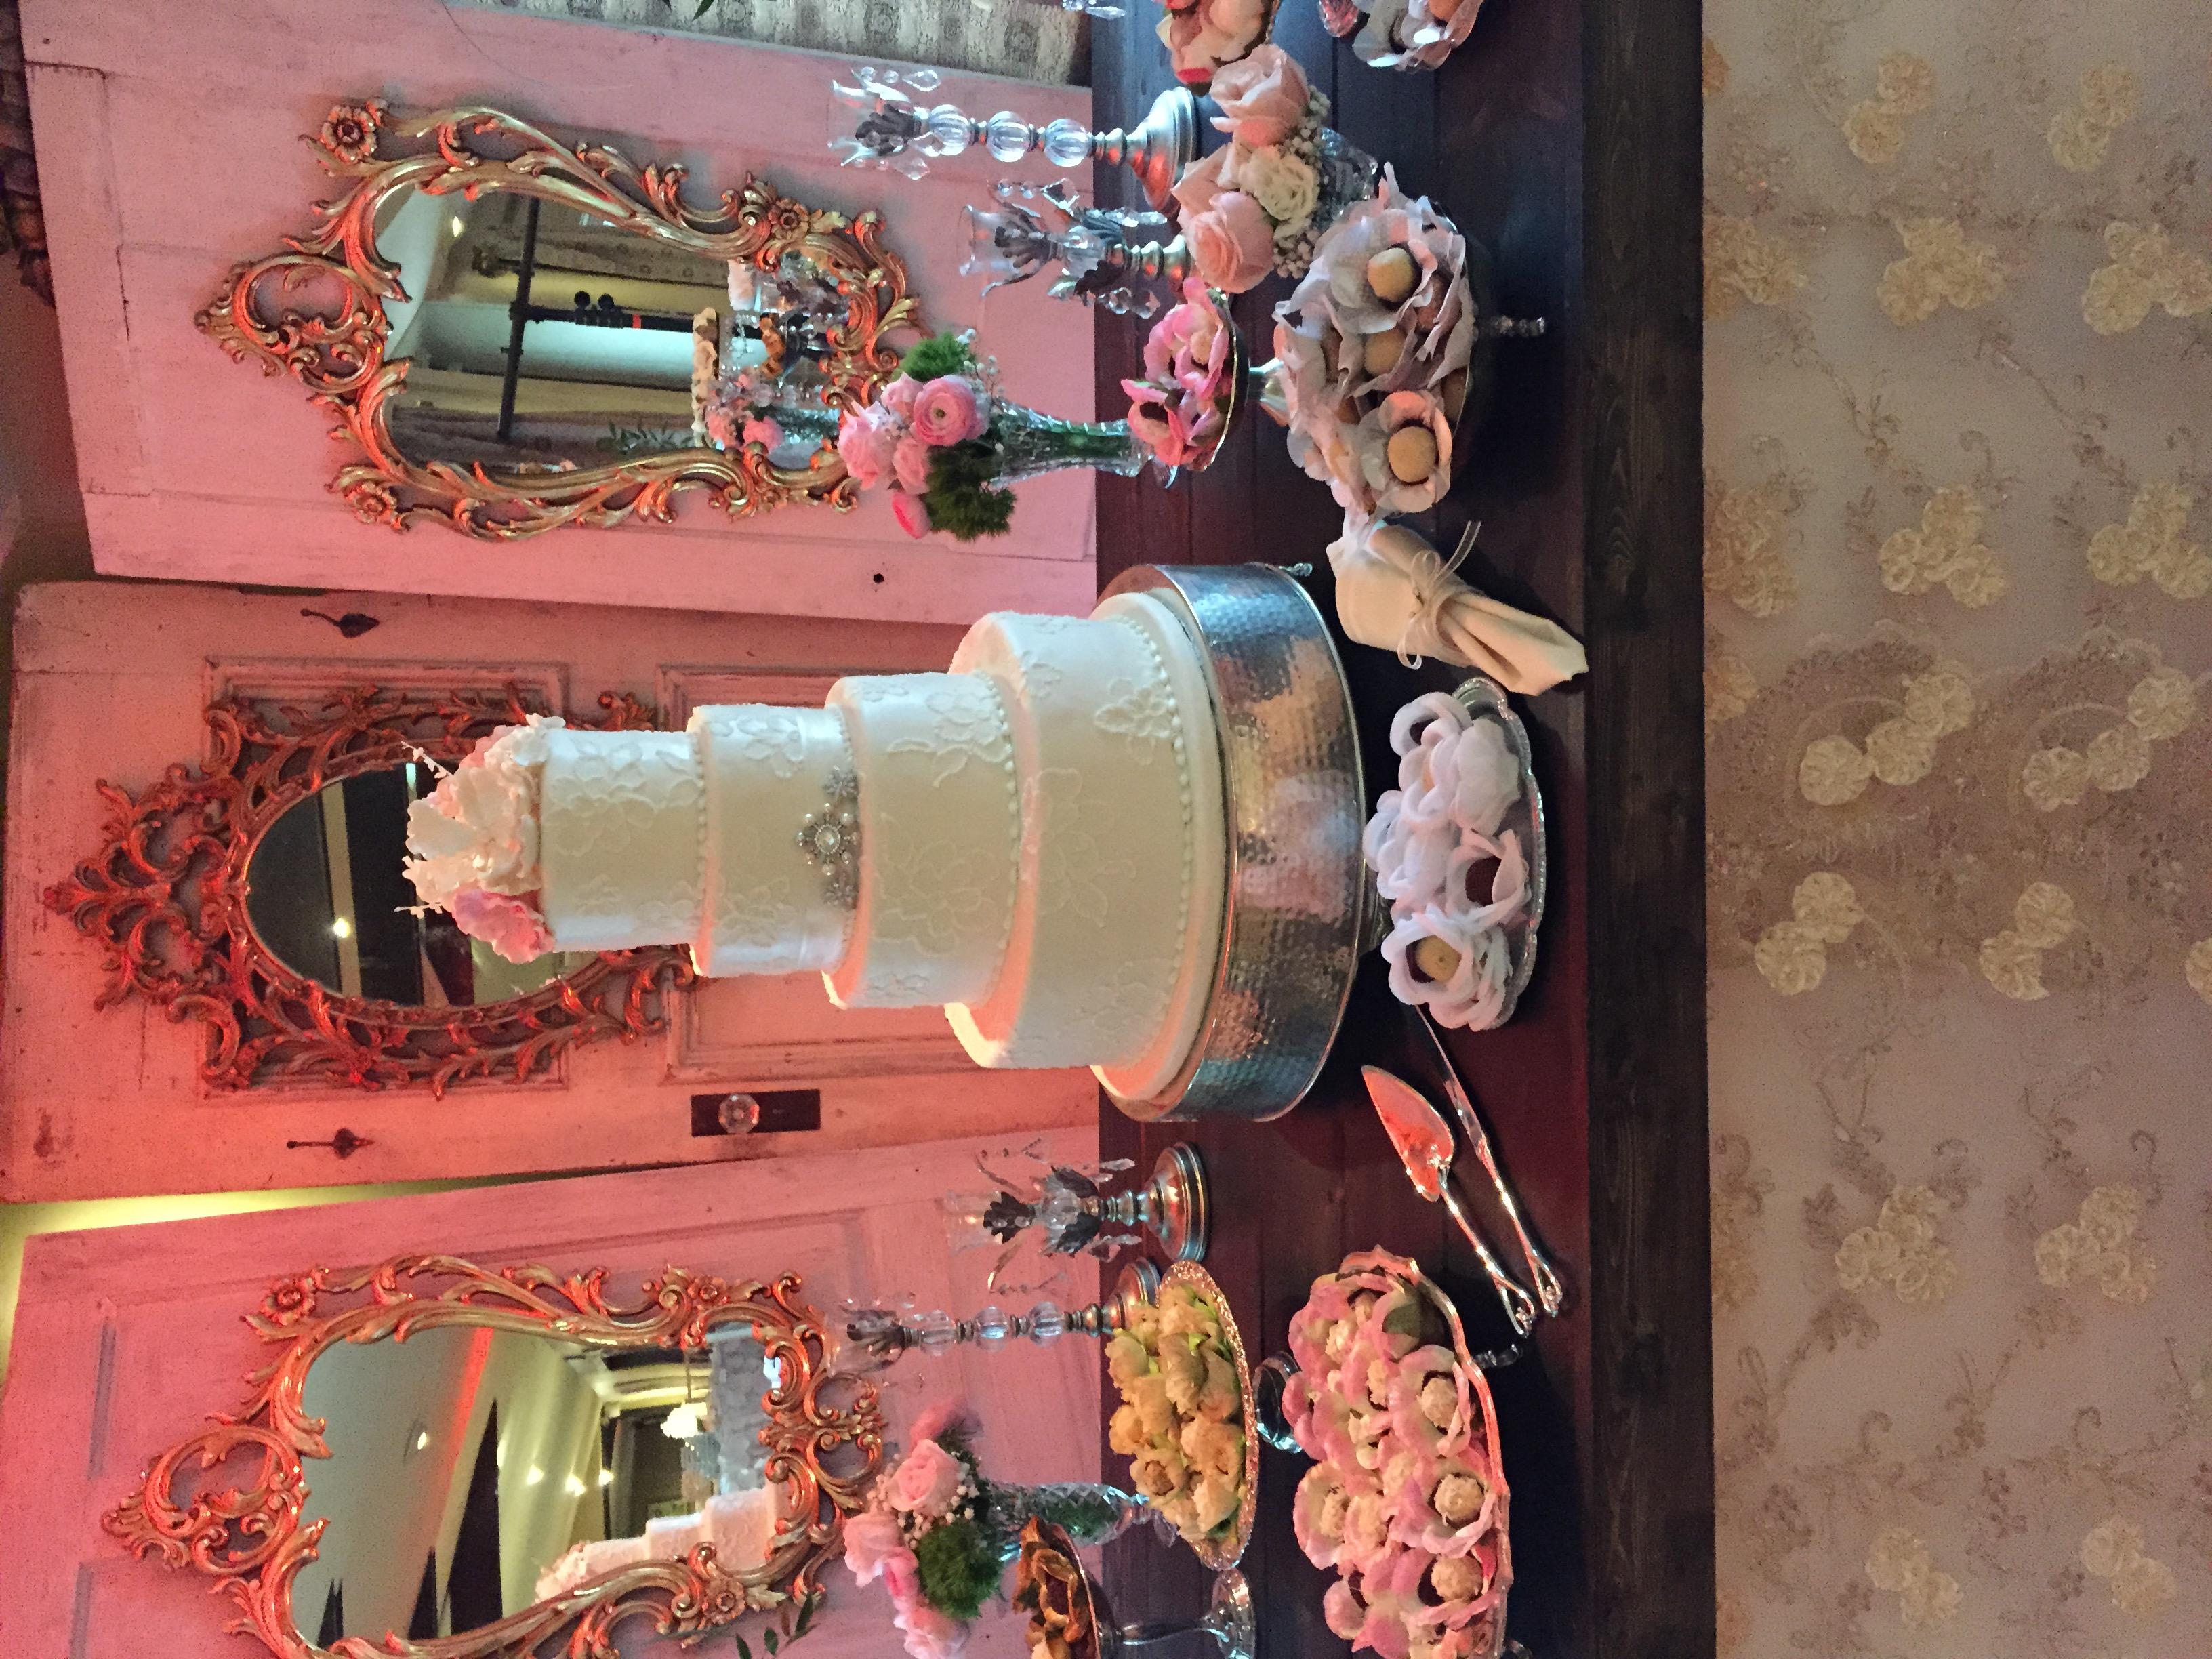 Wedding Cake wPastries4 Display